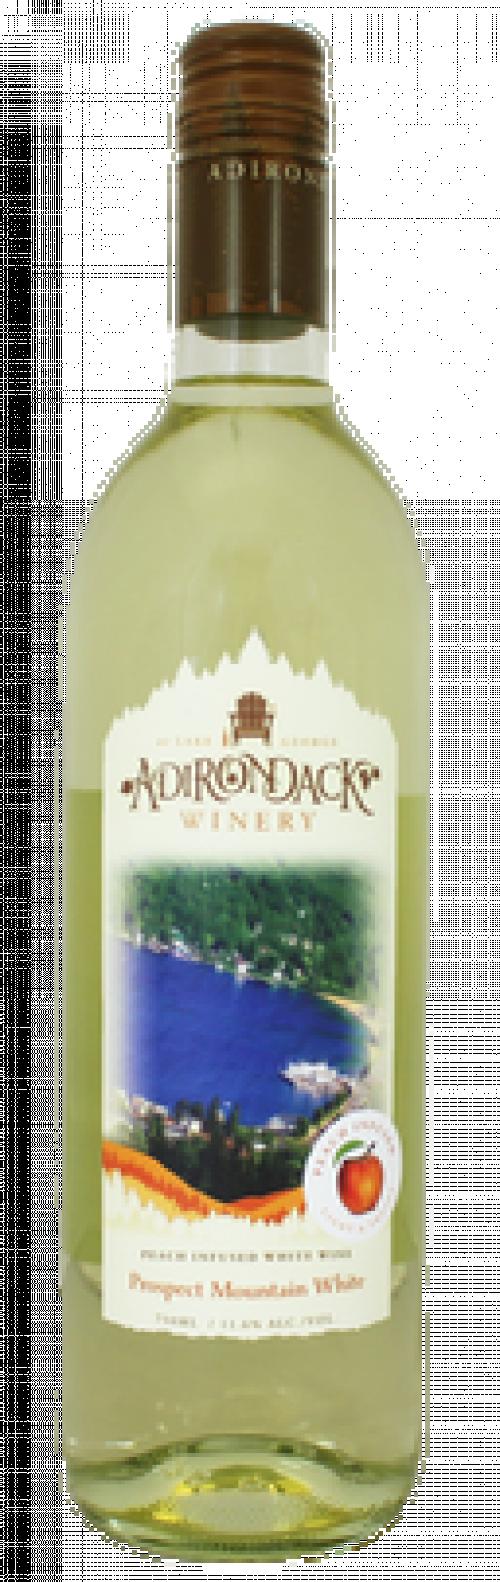 Adirondack Winery Prospect Mountain White 750ml NV